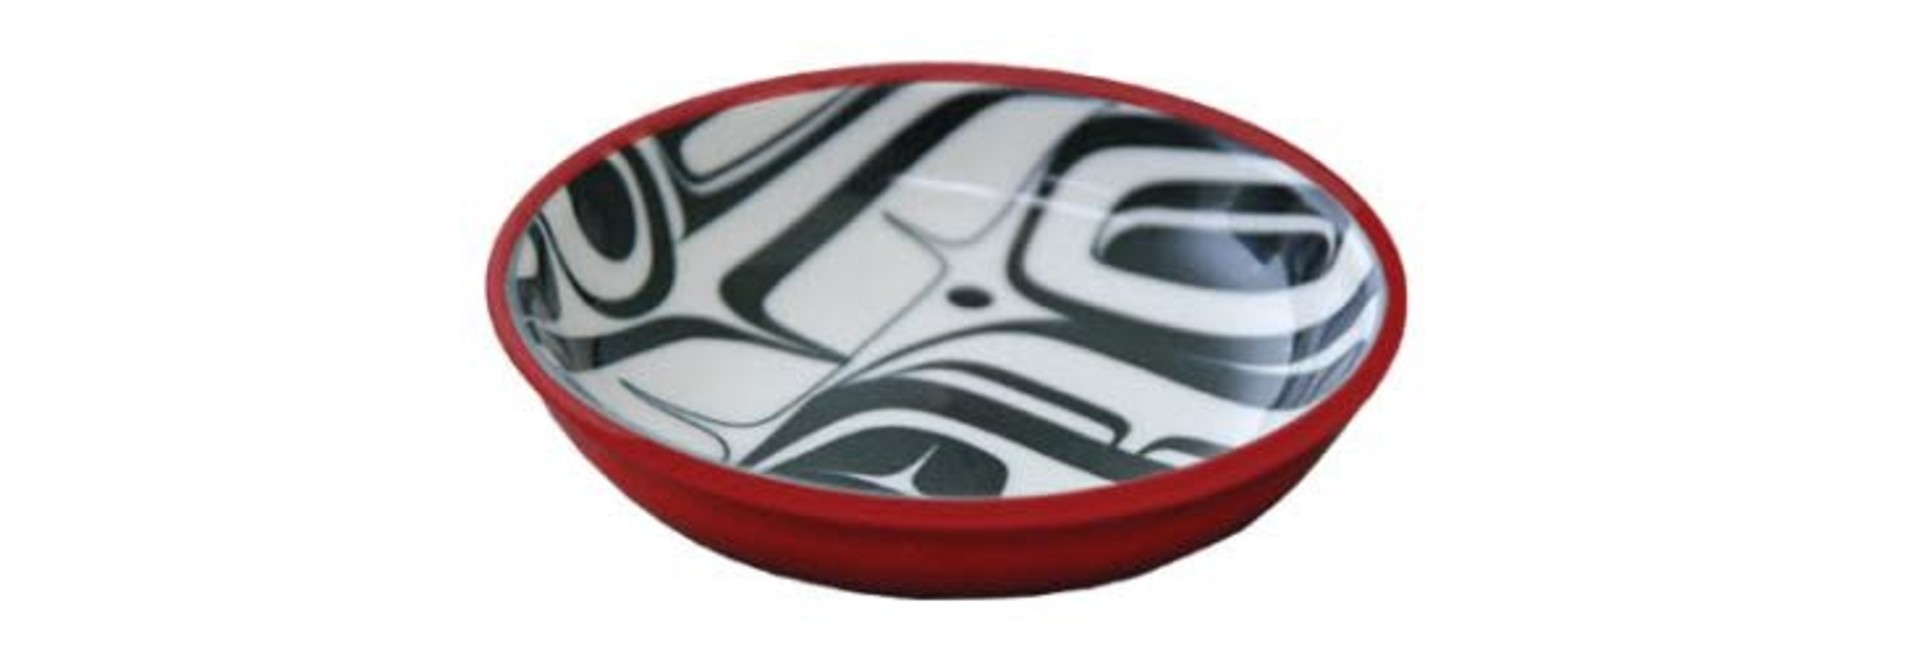 KR Raven Small Dish Red/Black Kelly Robinson